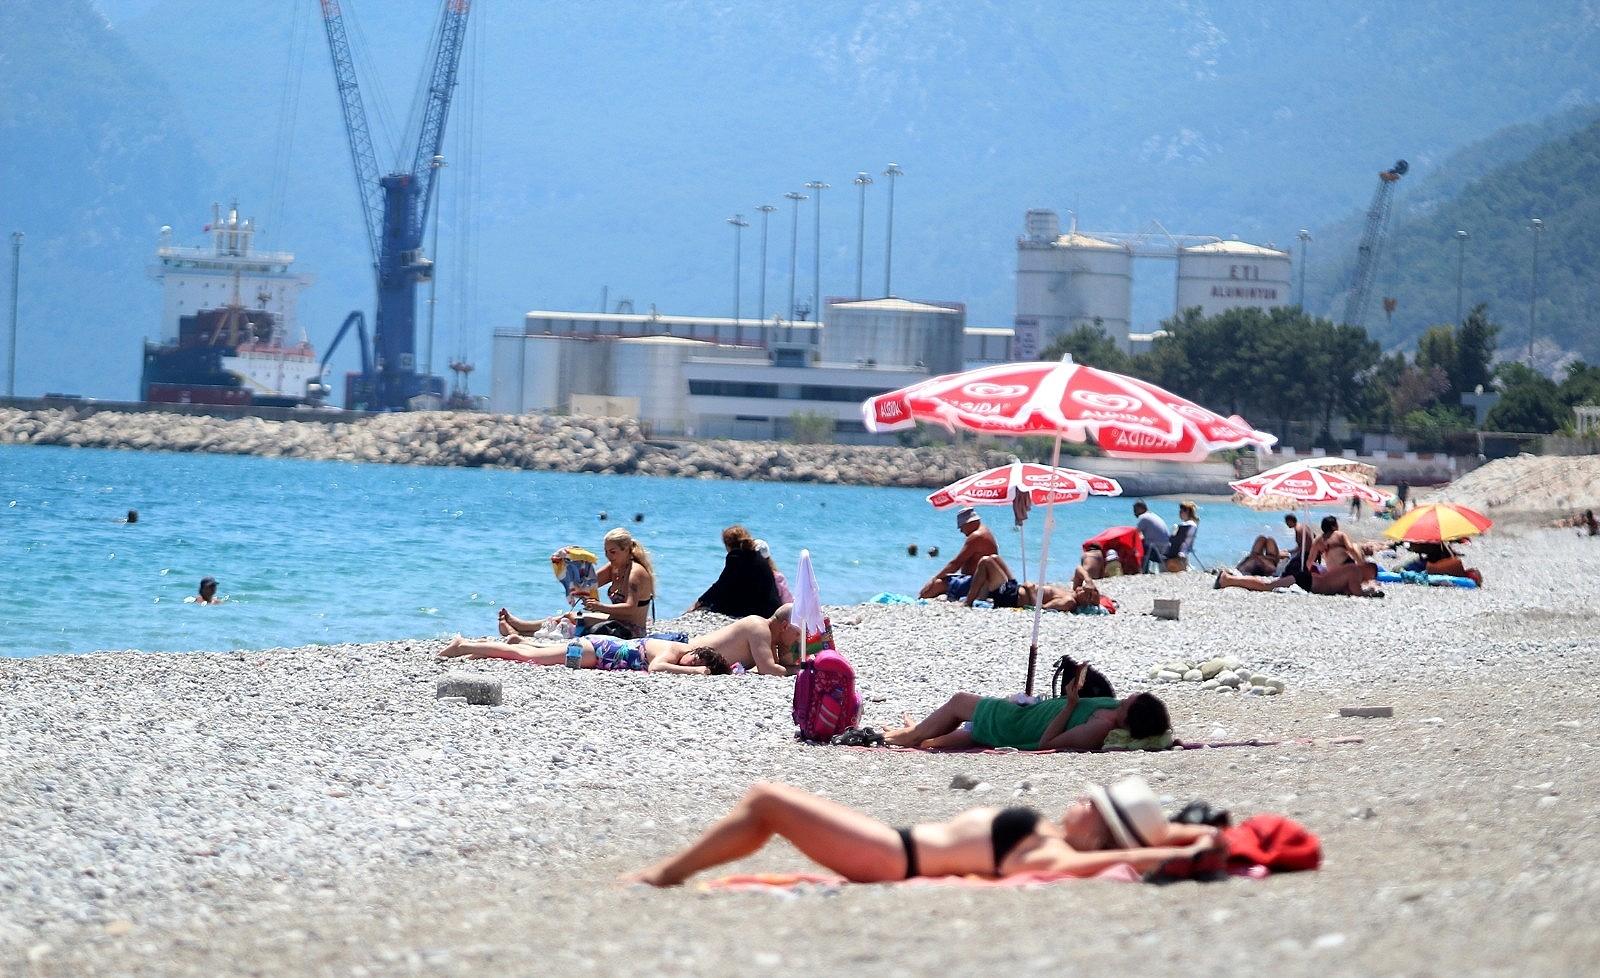 2021/05/sahilde-turist-yogunlugu-20210512AW31-2.jpg